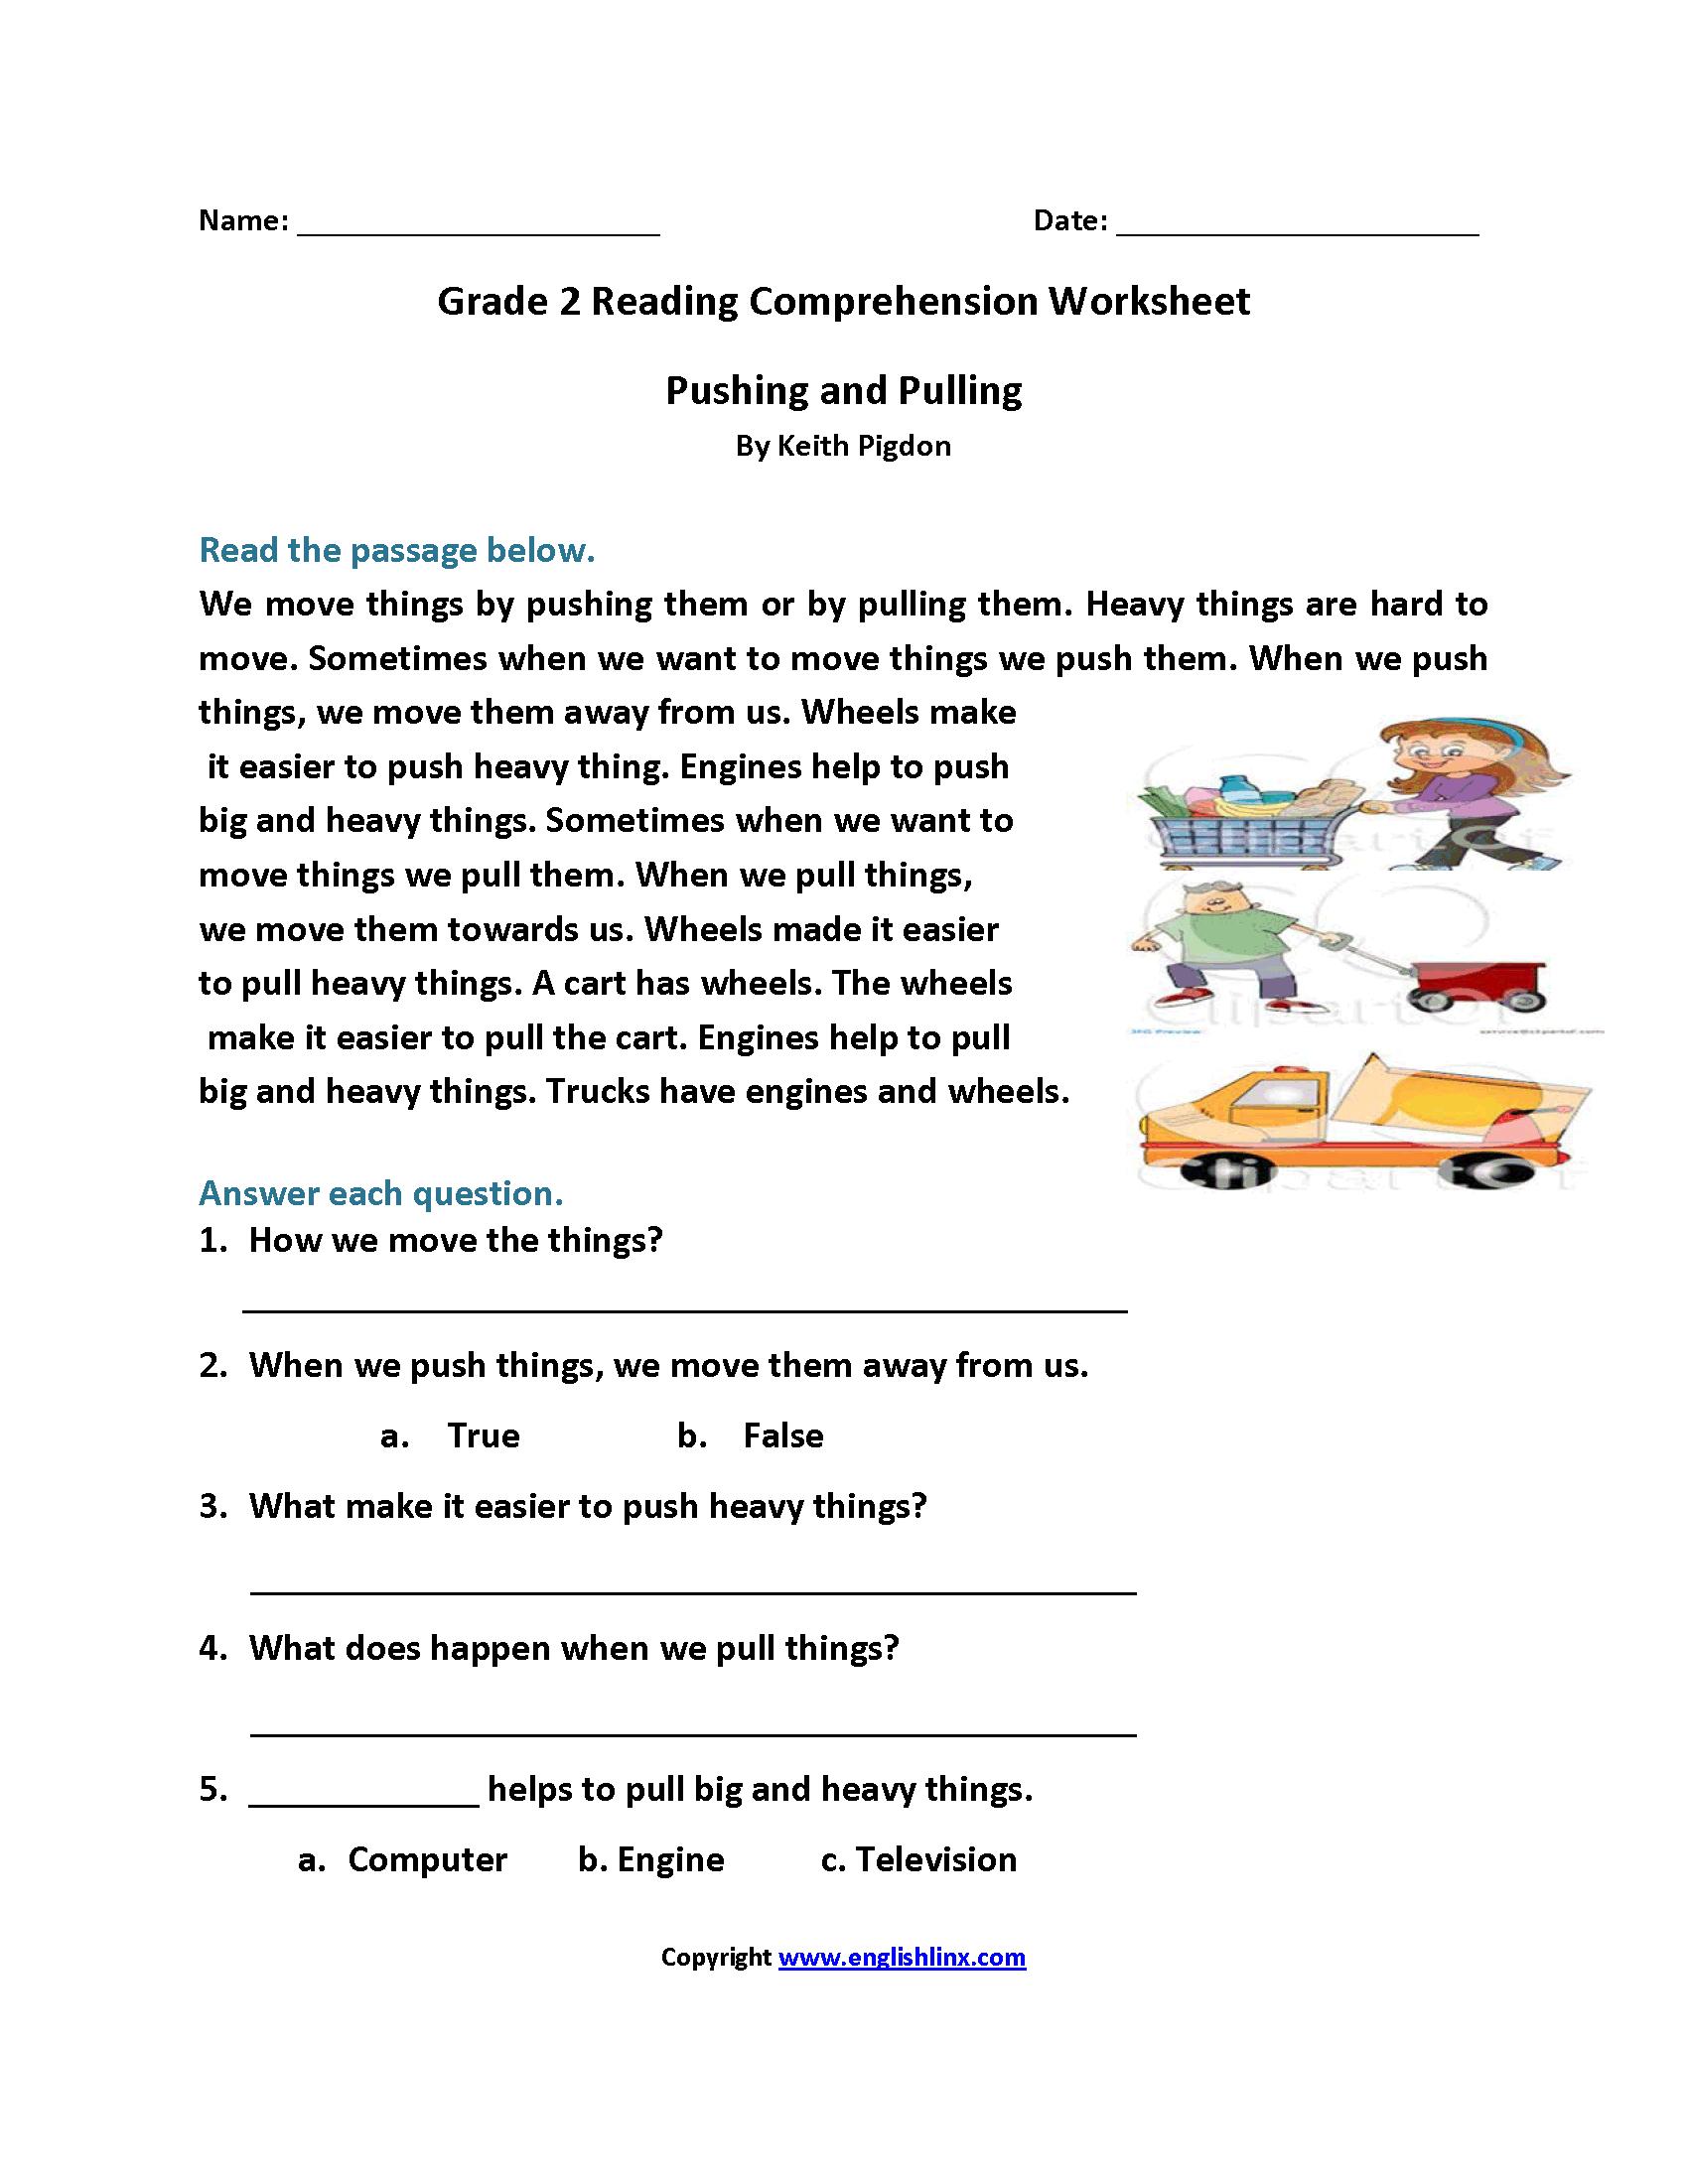 Reading Worksheets  Second Grade Reading Worksheets Together With Easy Reading Worksheets